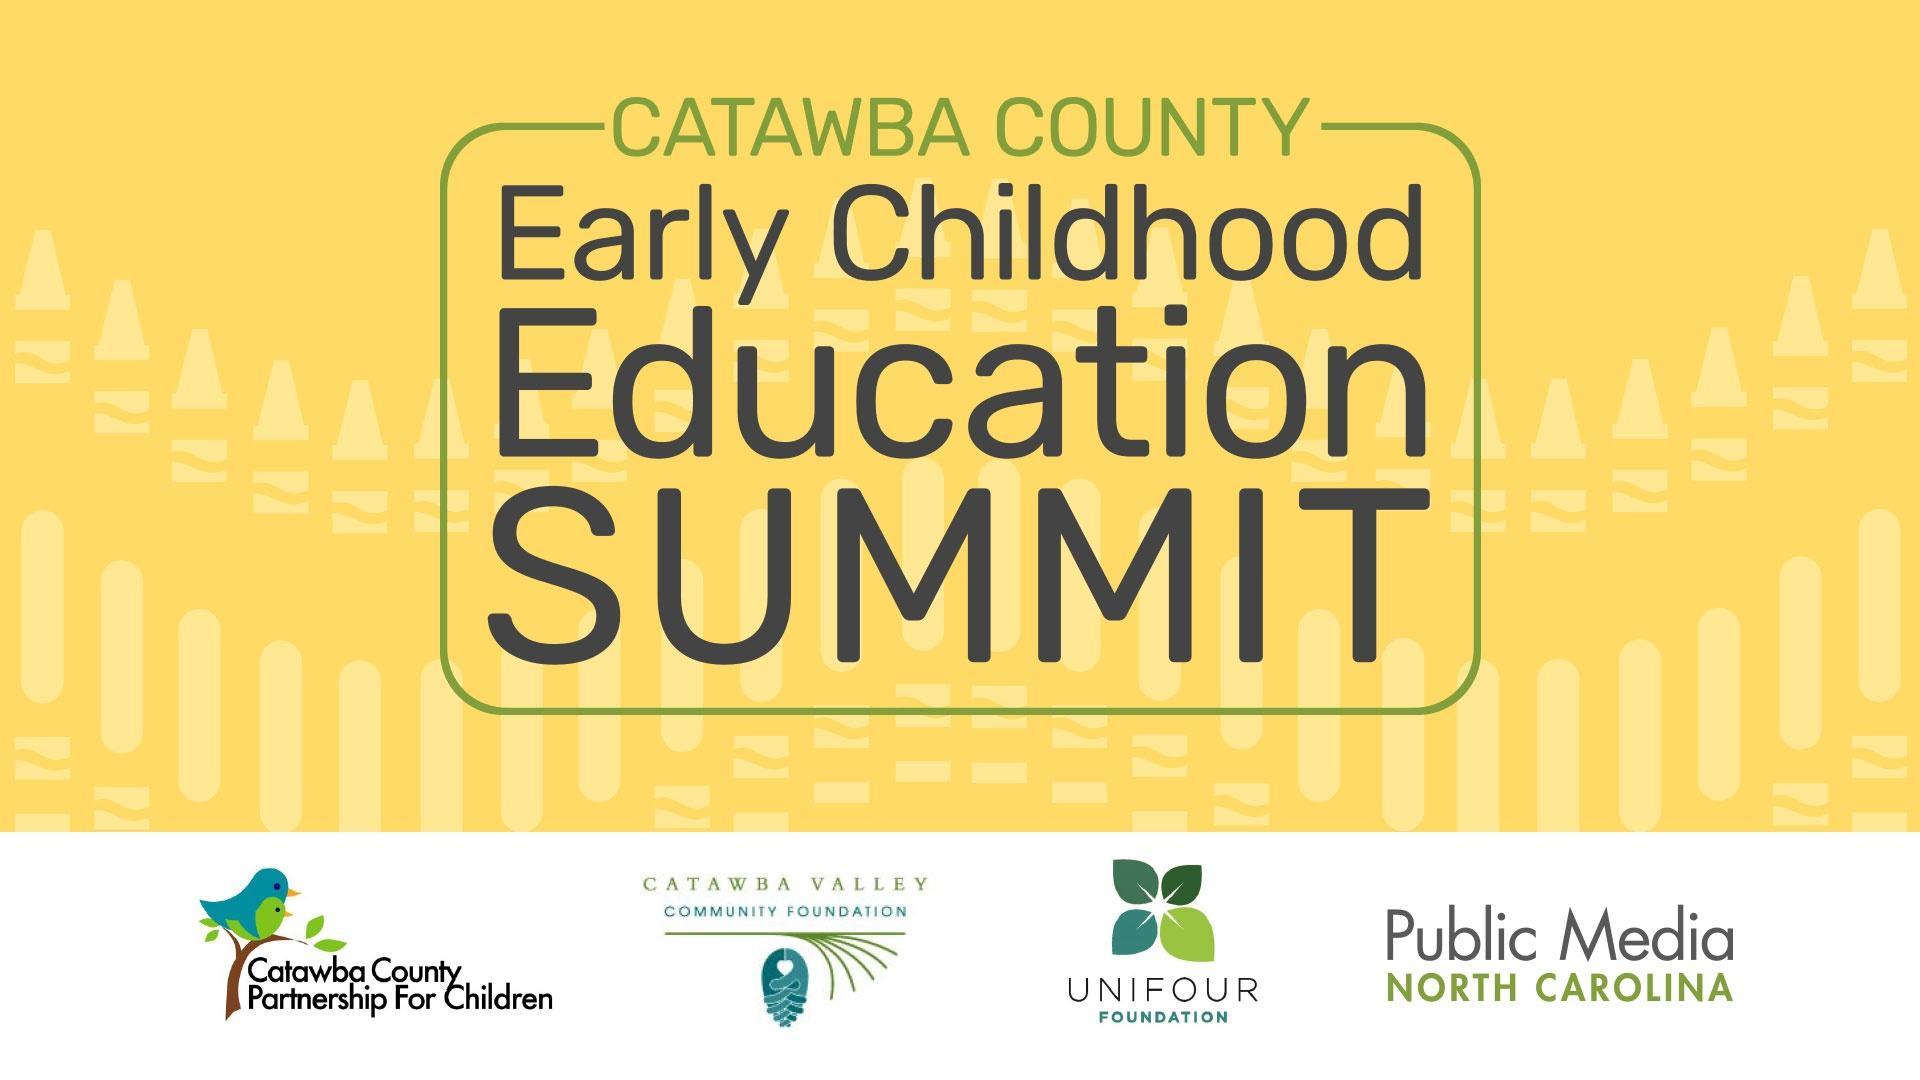 Catawba : Early Childhood Education Summit